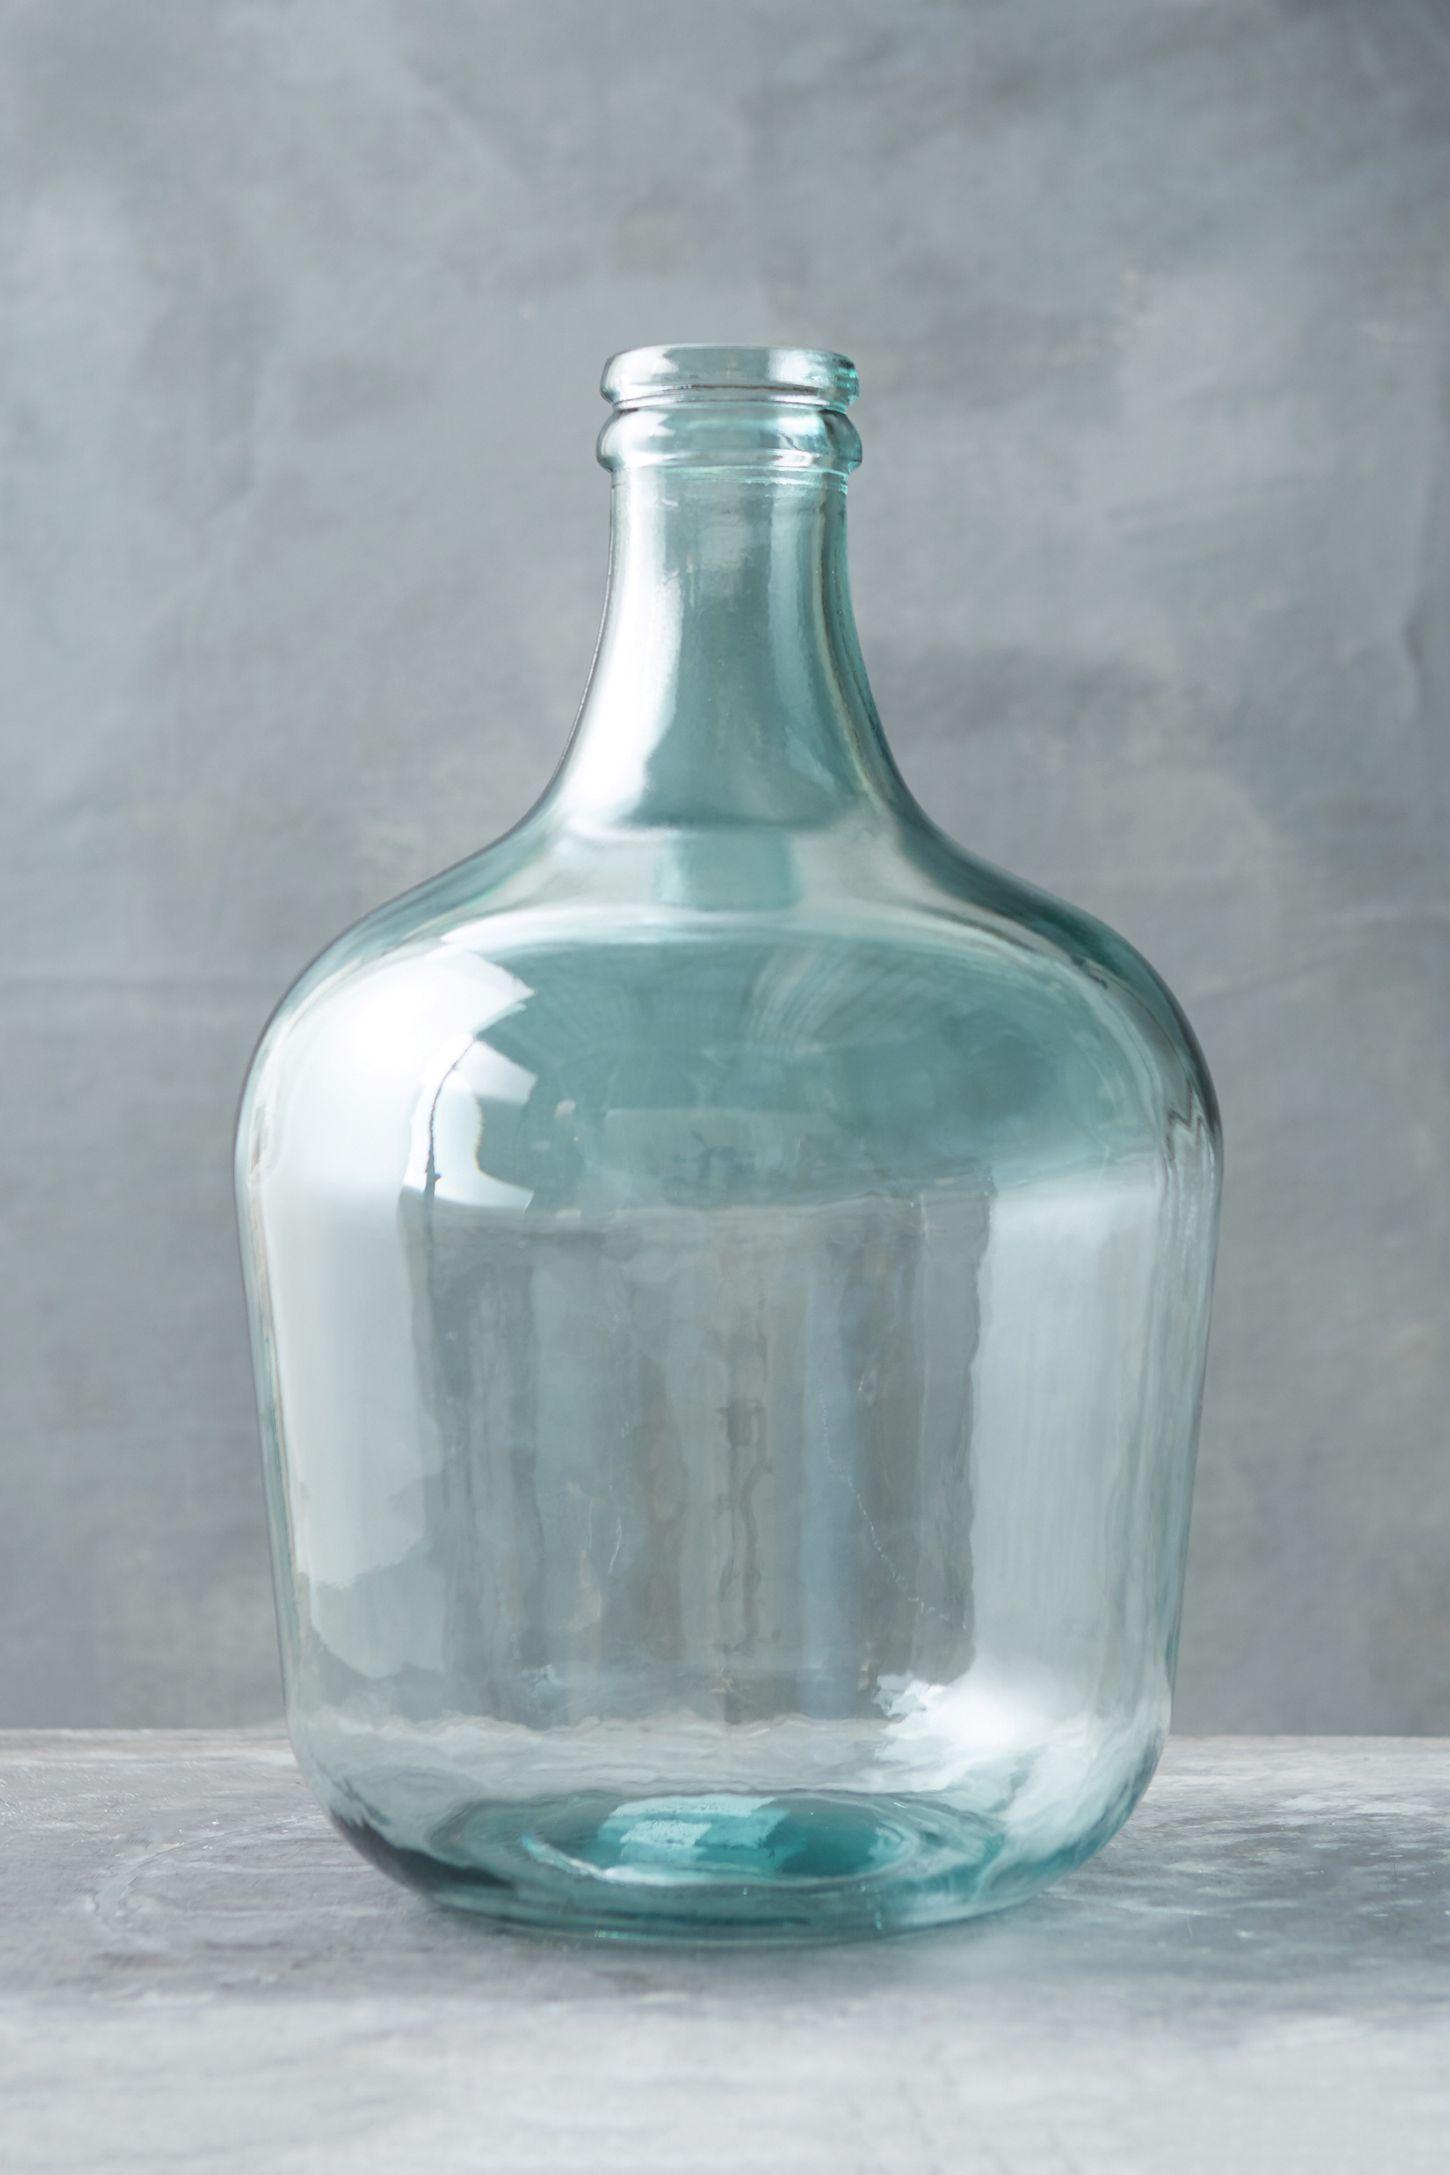 Recycled Glass Bottleneck Vase Anthropologie In 2020 Glass Jugs Decor Recycled Glass Jug Decor